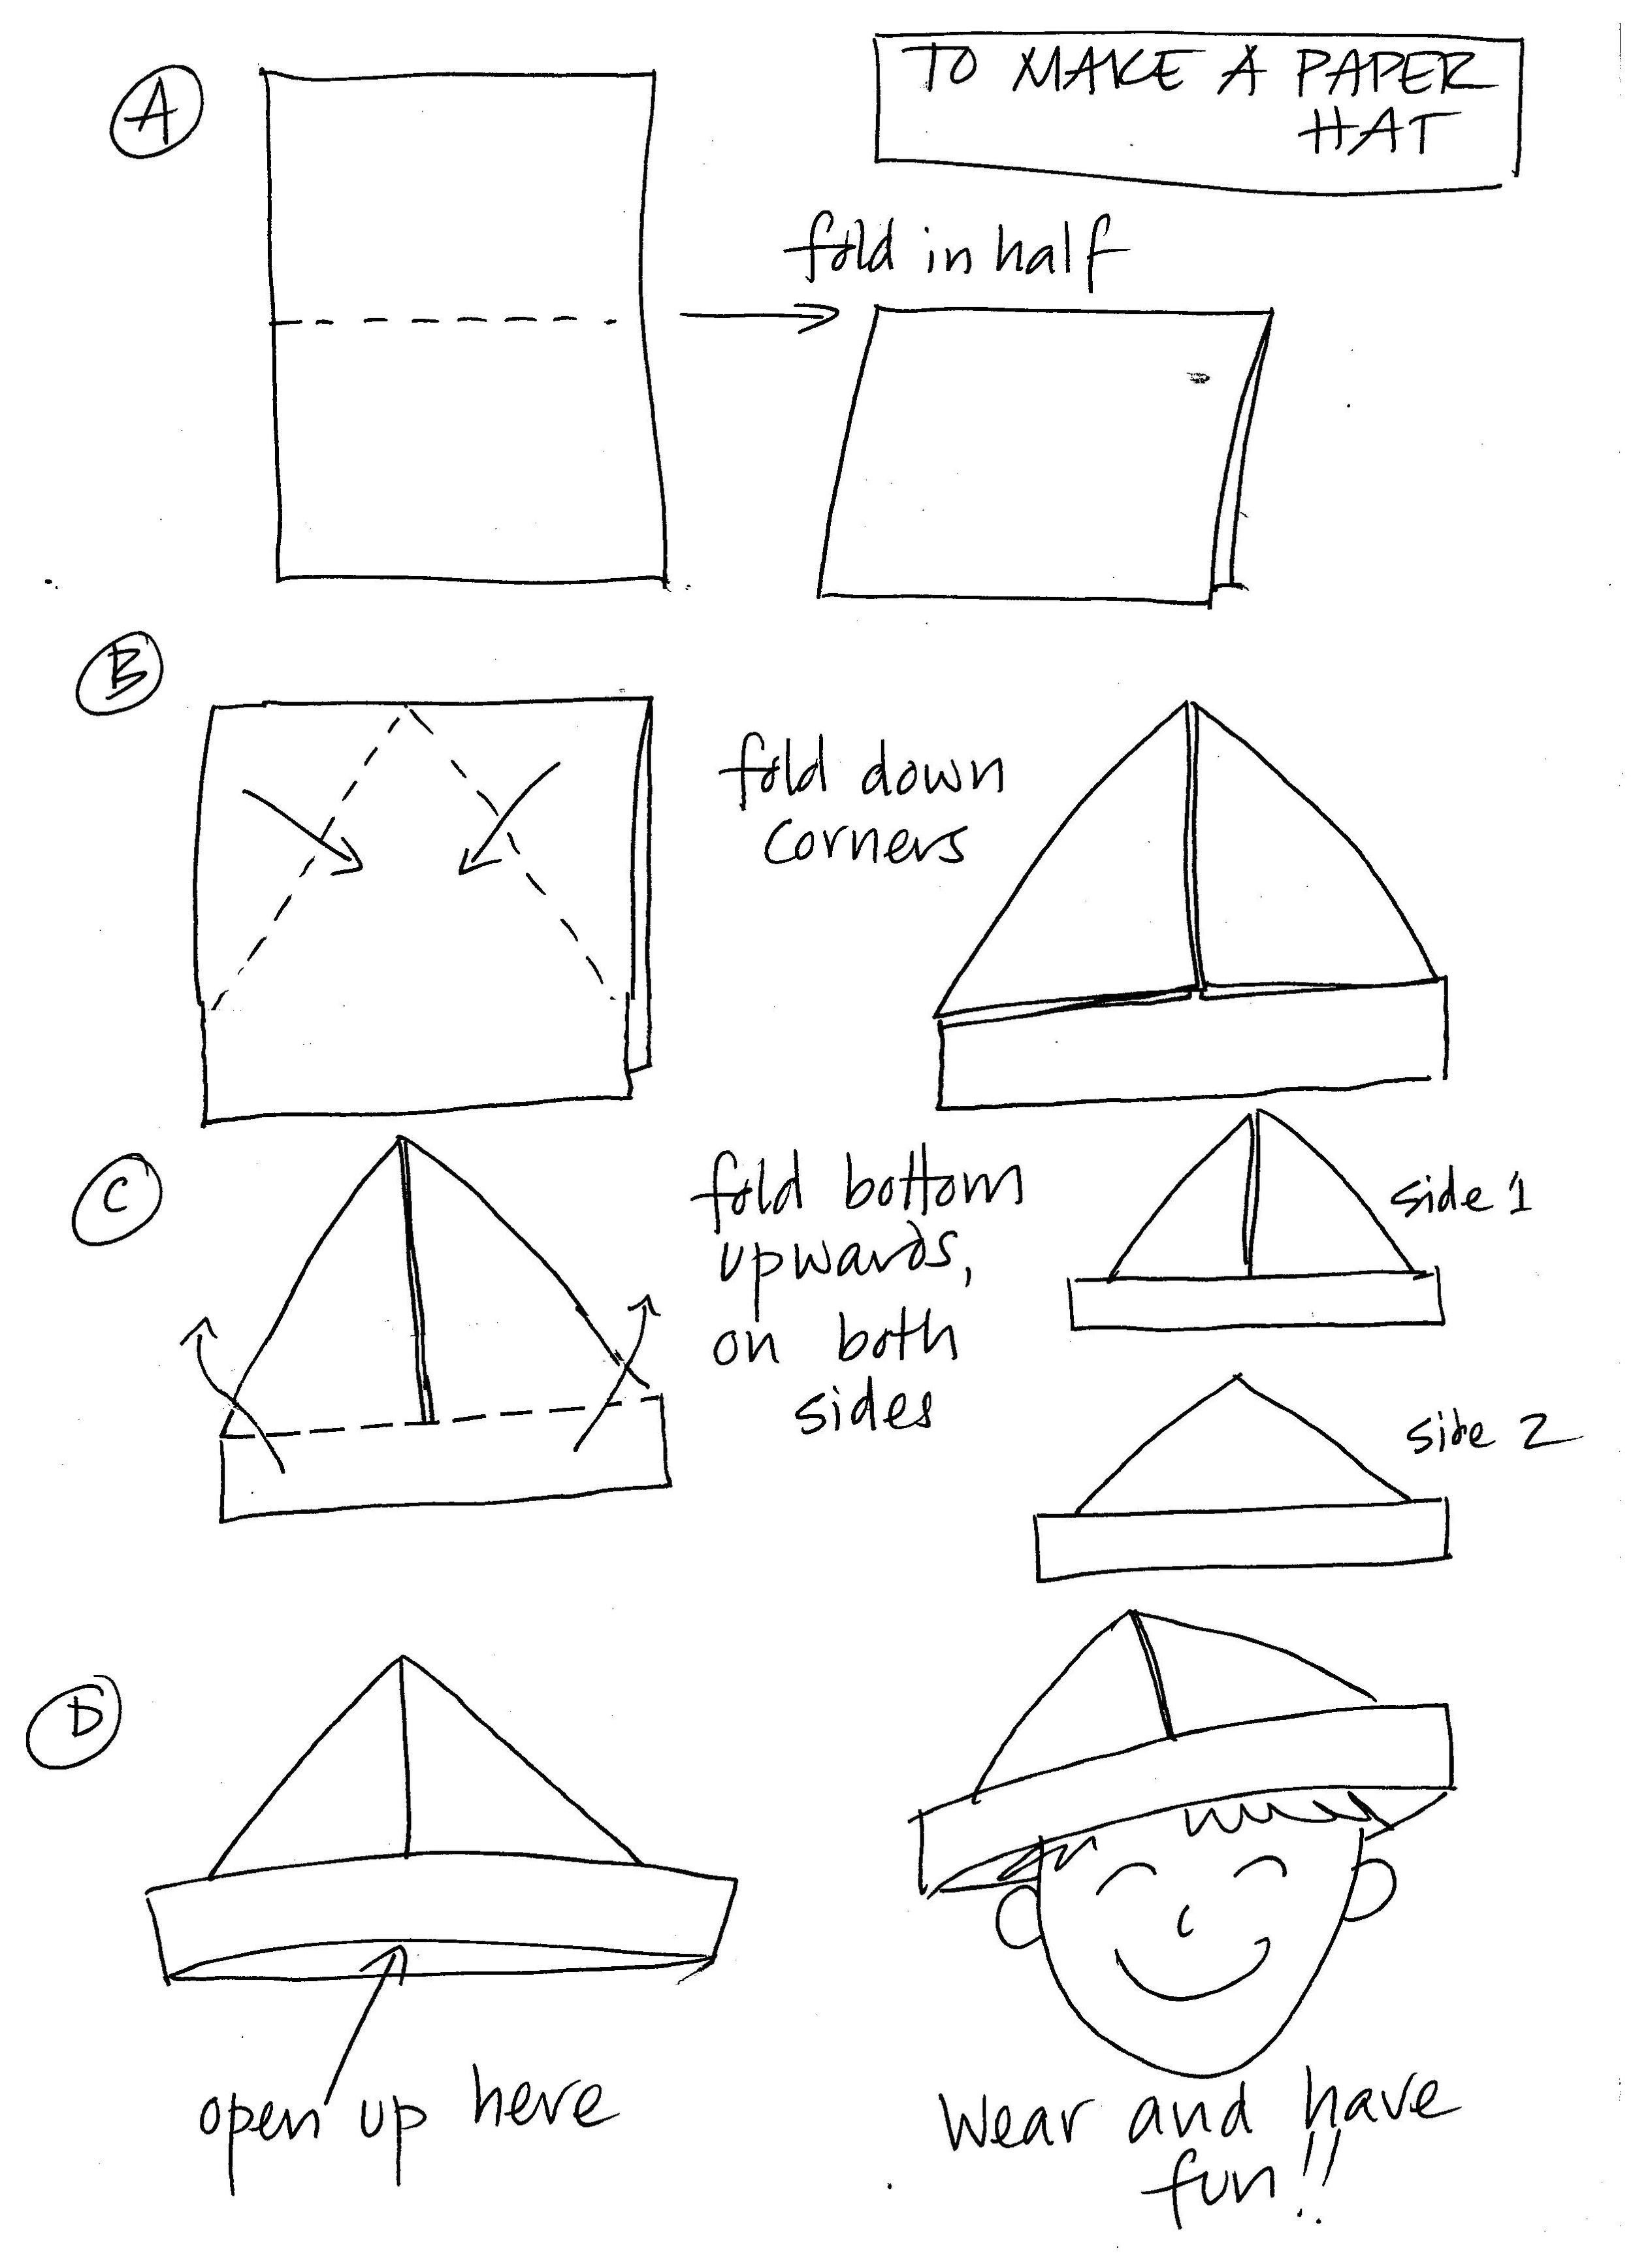 paper hat instructions.jpg